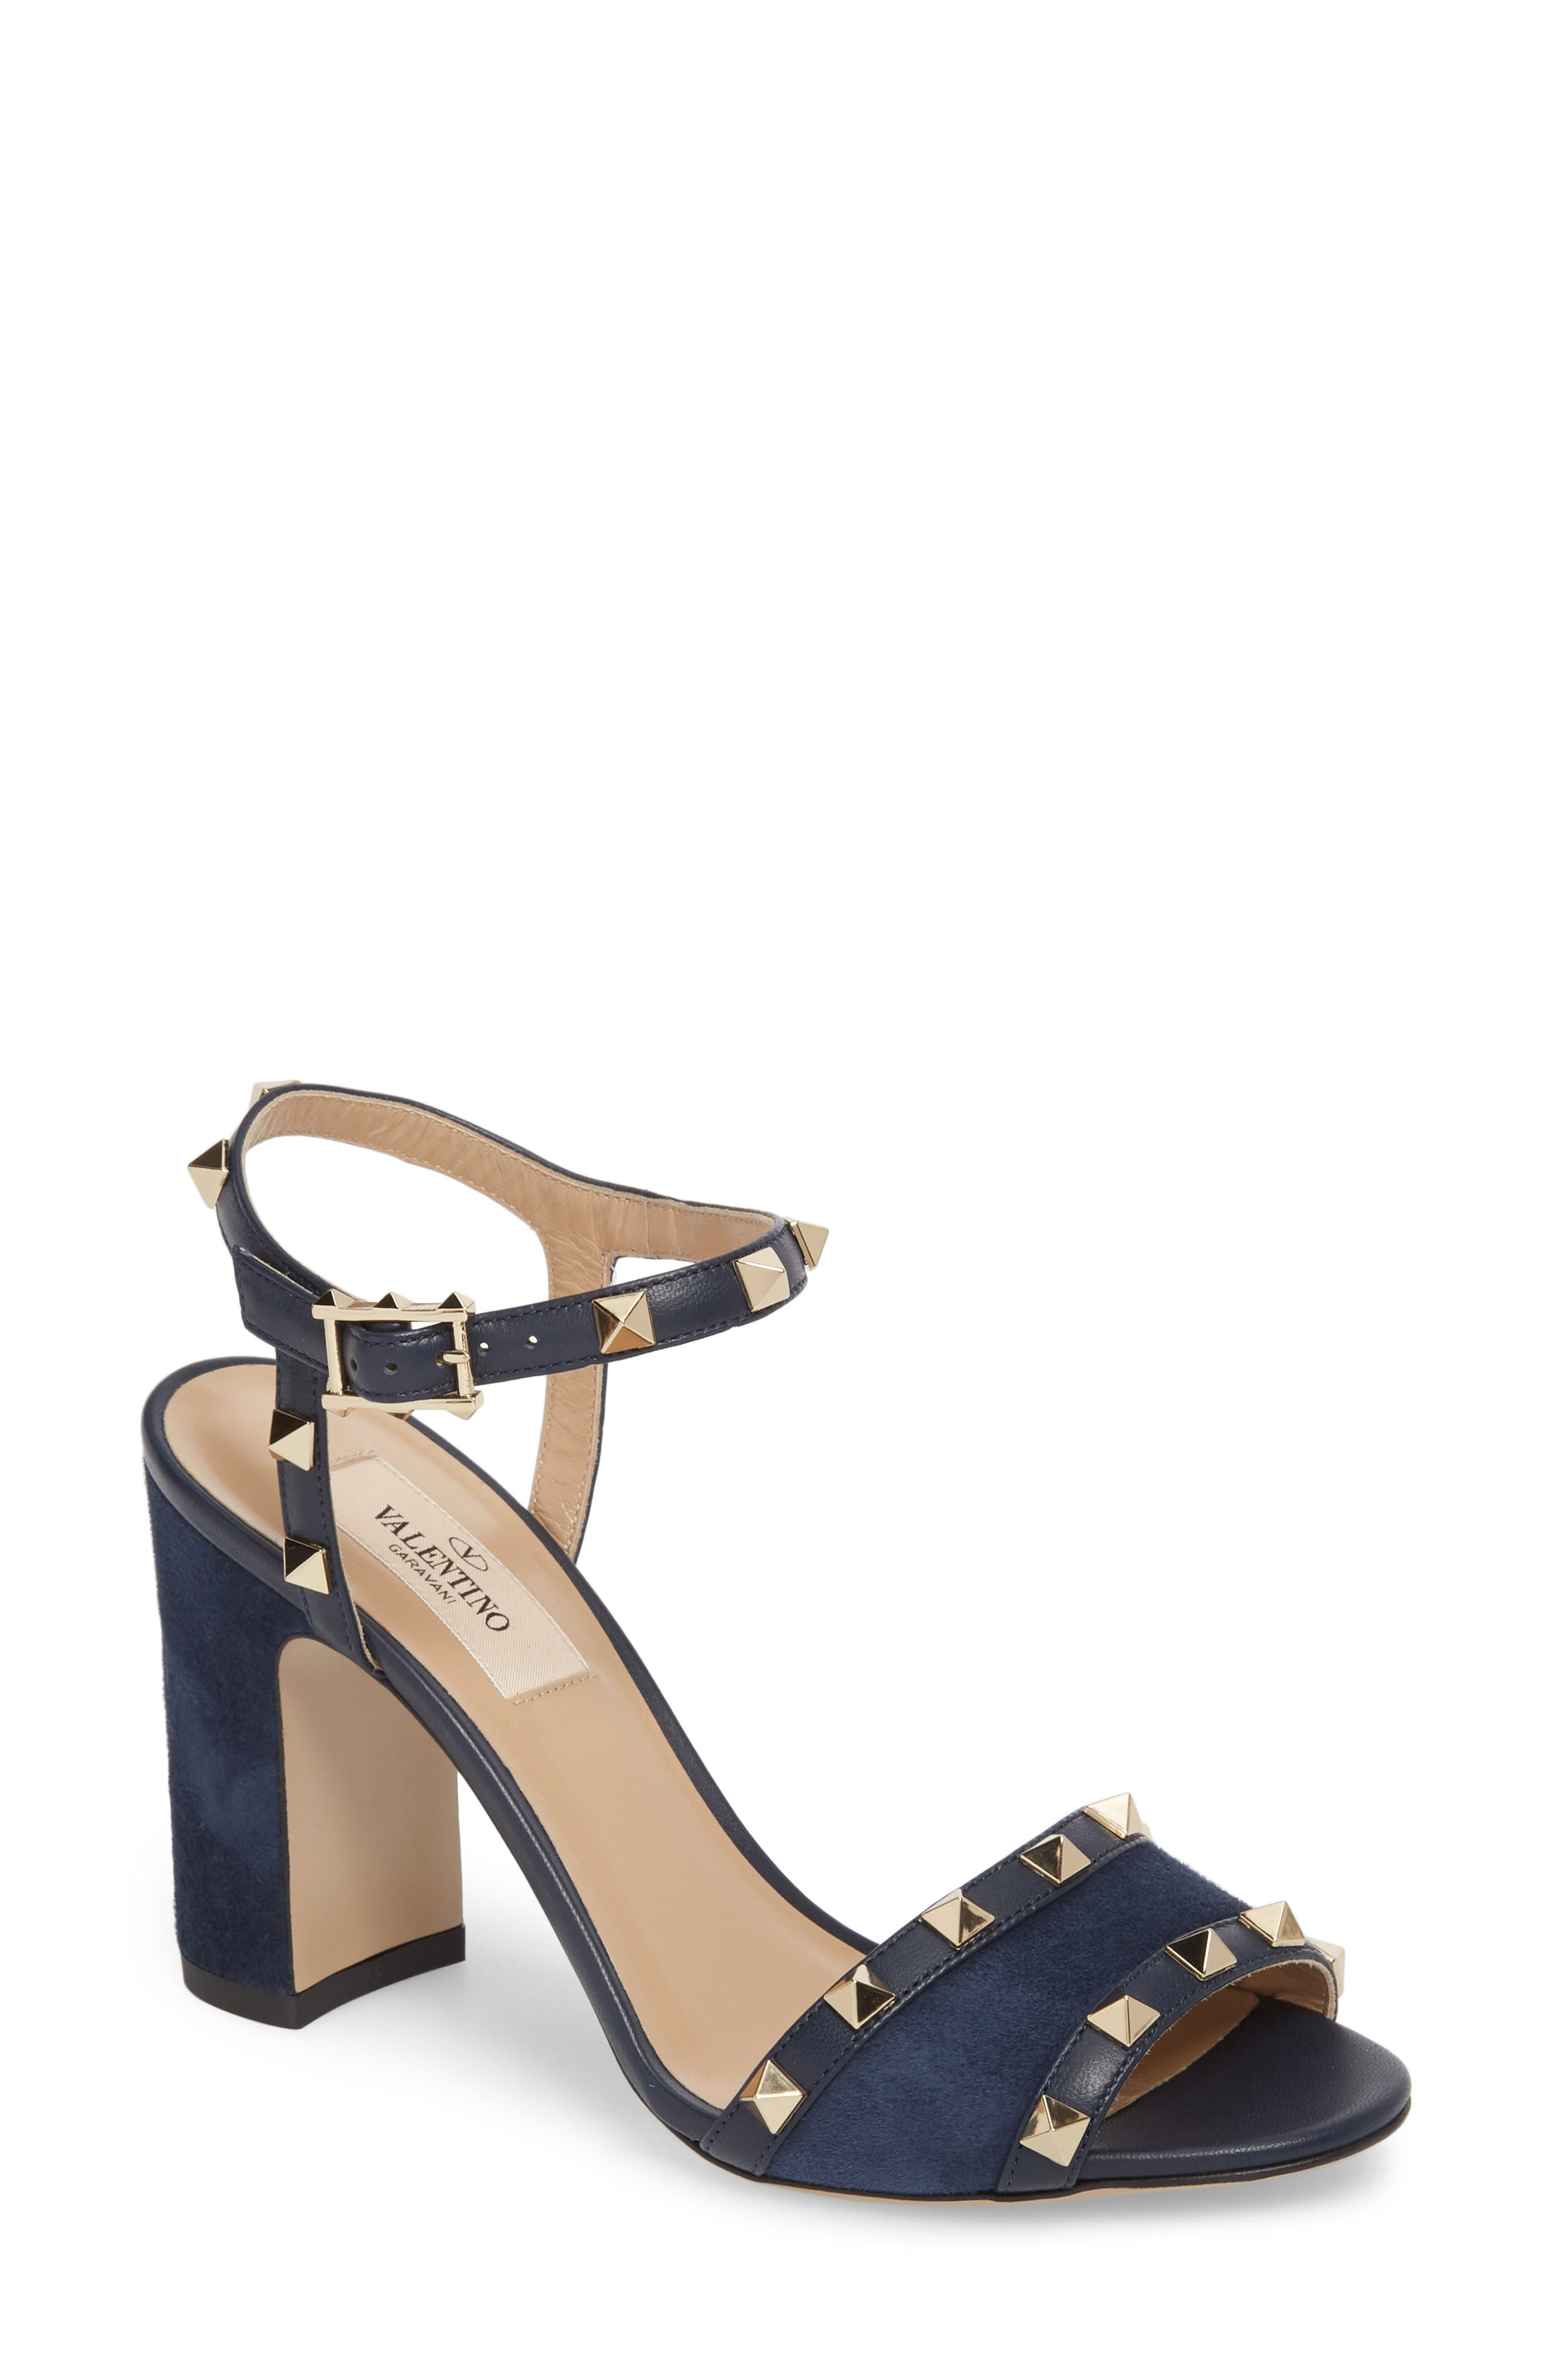 Rockstud Suede Sandal,                         Main,                         color, MARINE SUEDE